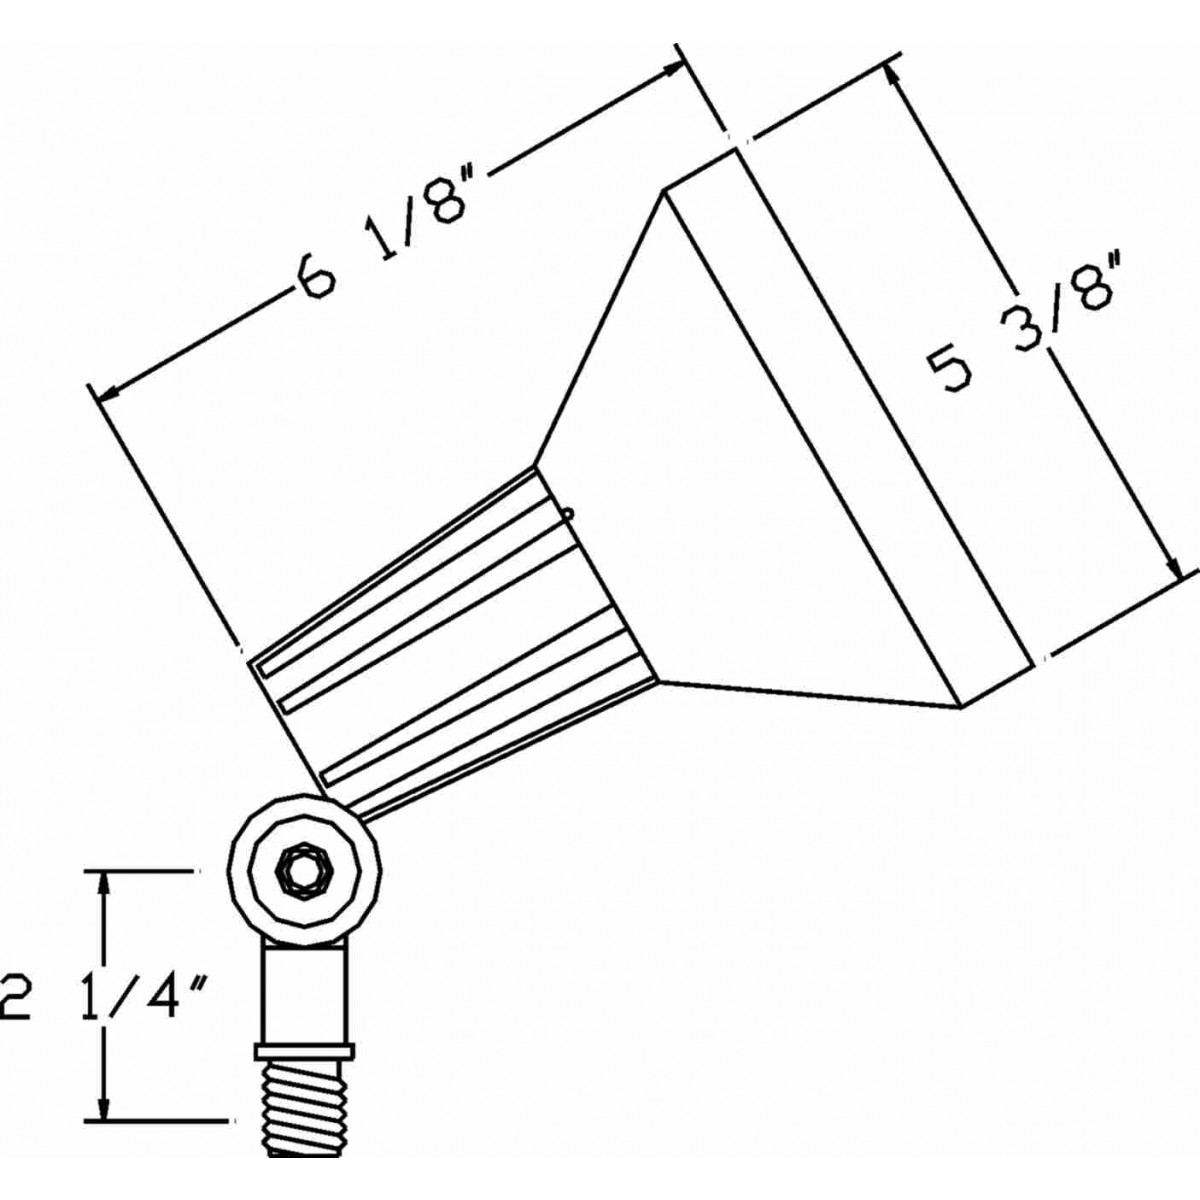 Metal Halide Light Wiring Diagram For